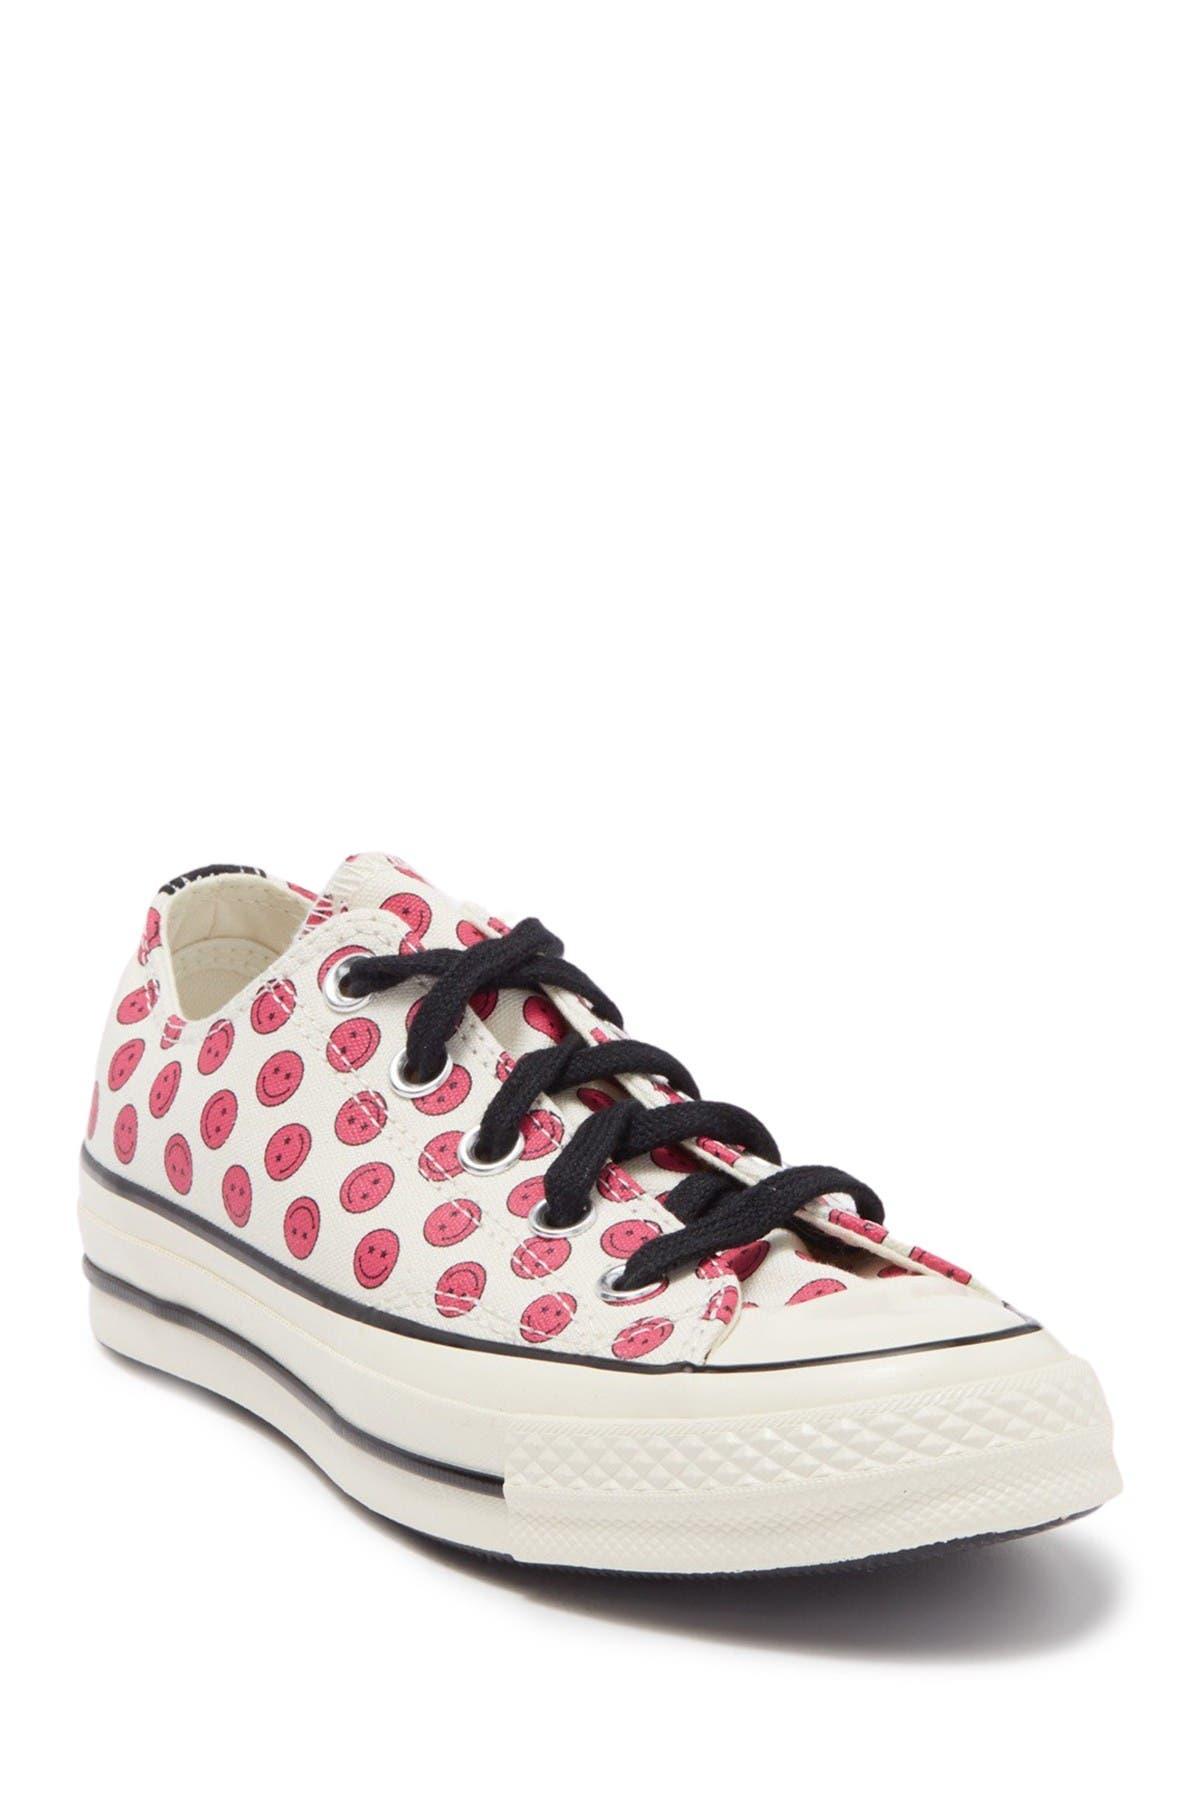 Image of Converse Chuck 70 Oxford Smiley Sneaker